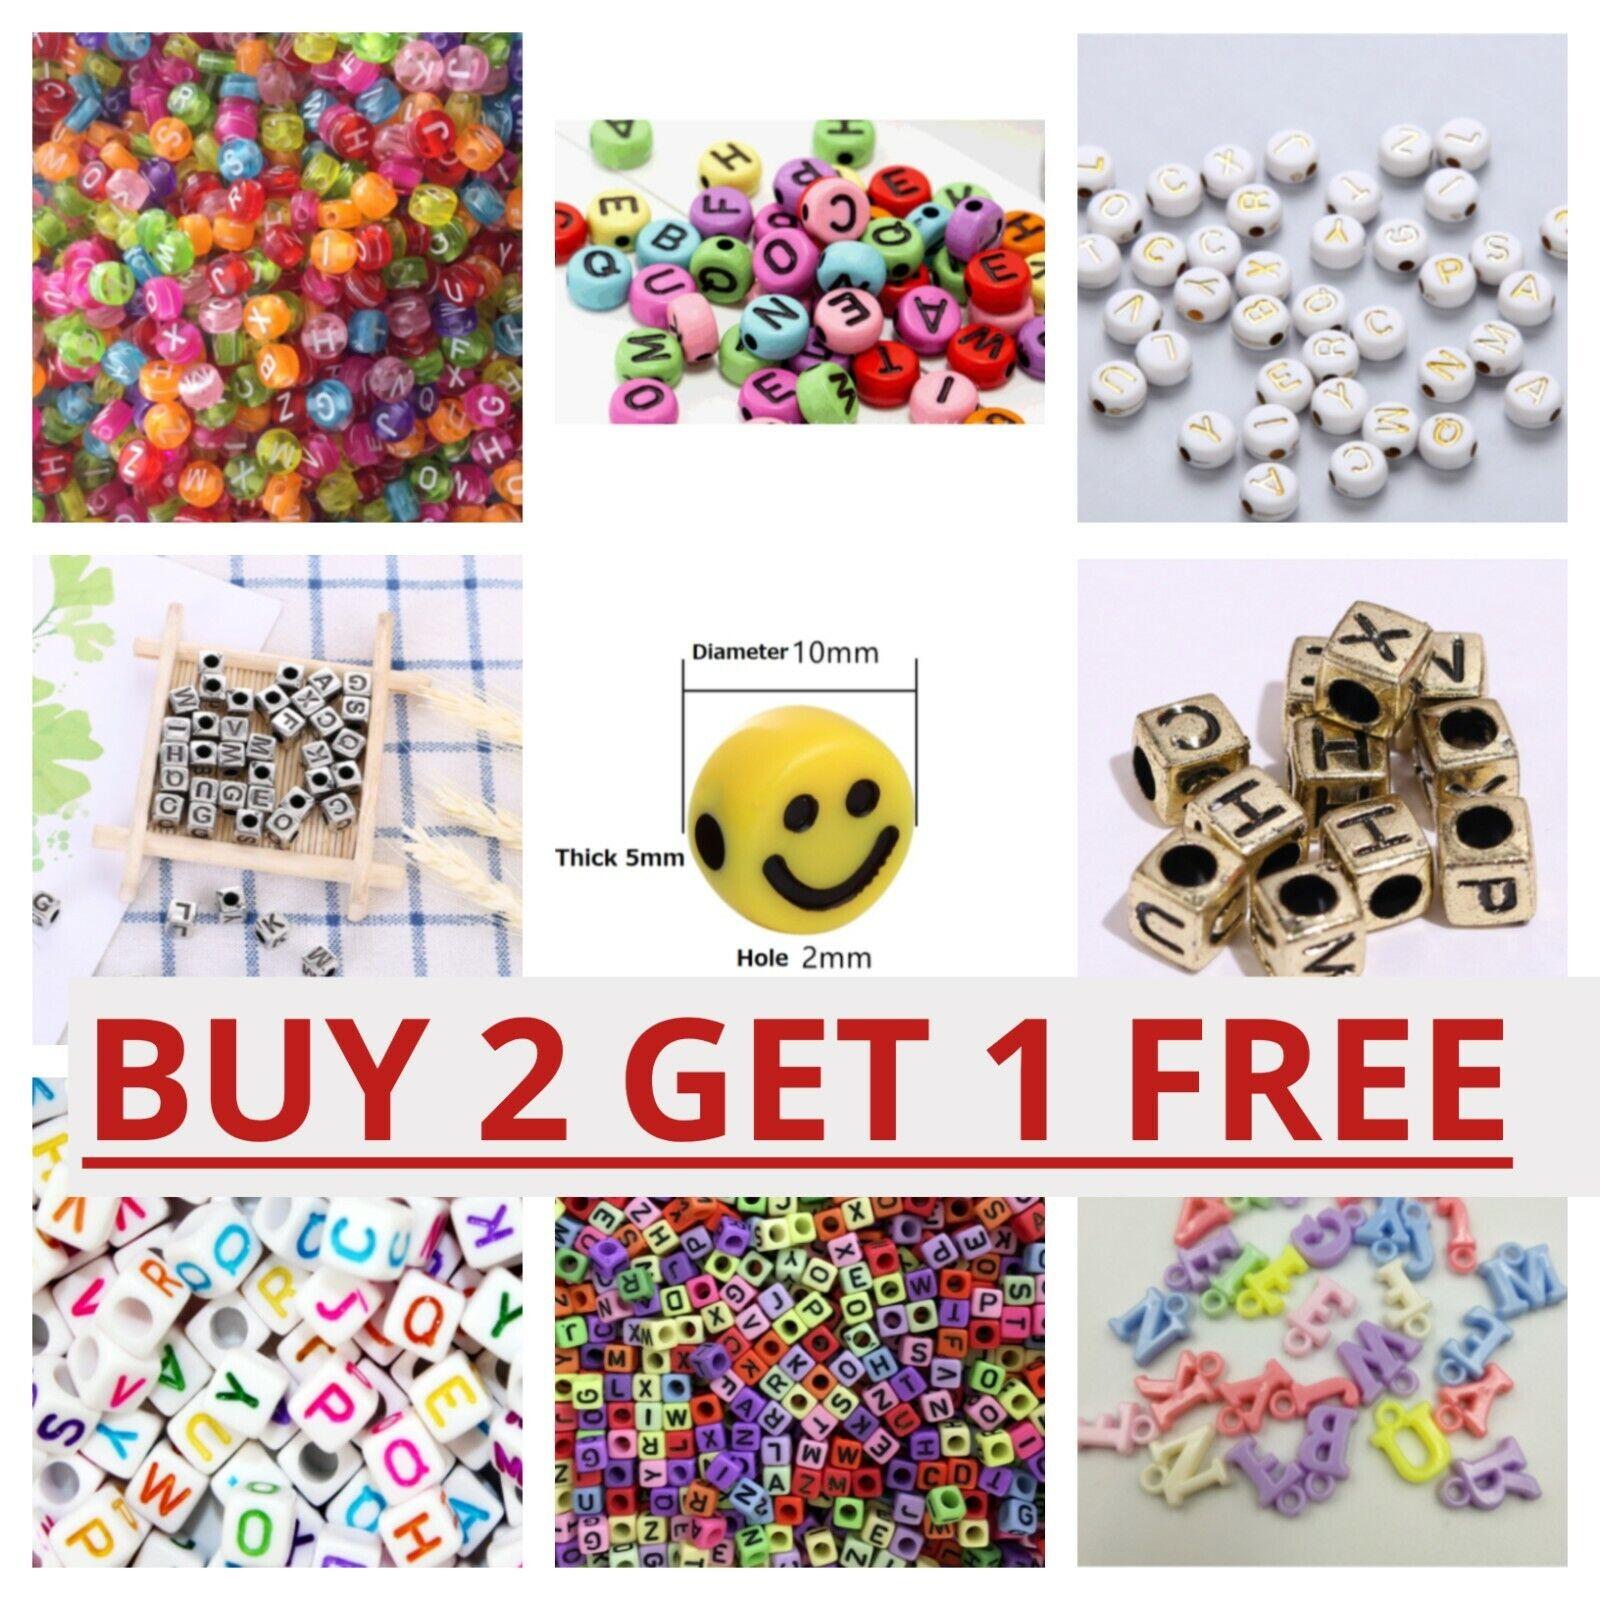 Jewellery - 200 Alphabet Letter Mixed Colour Beads Gems Kids Girls DIY Jewellery Xmas Gift